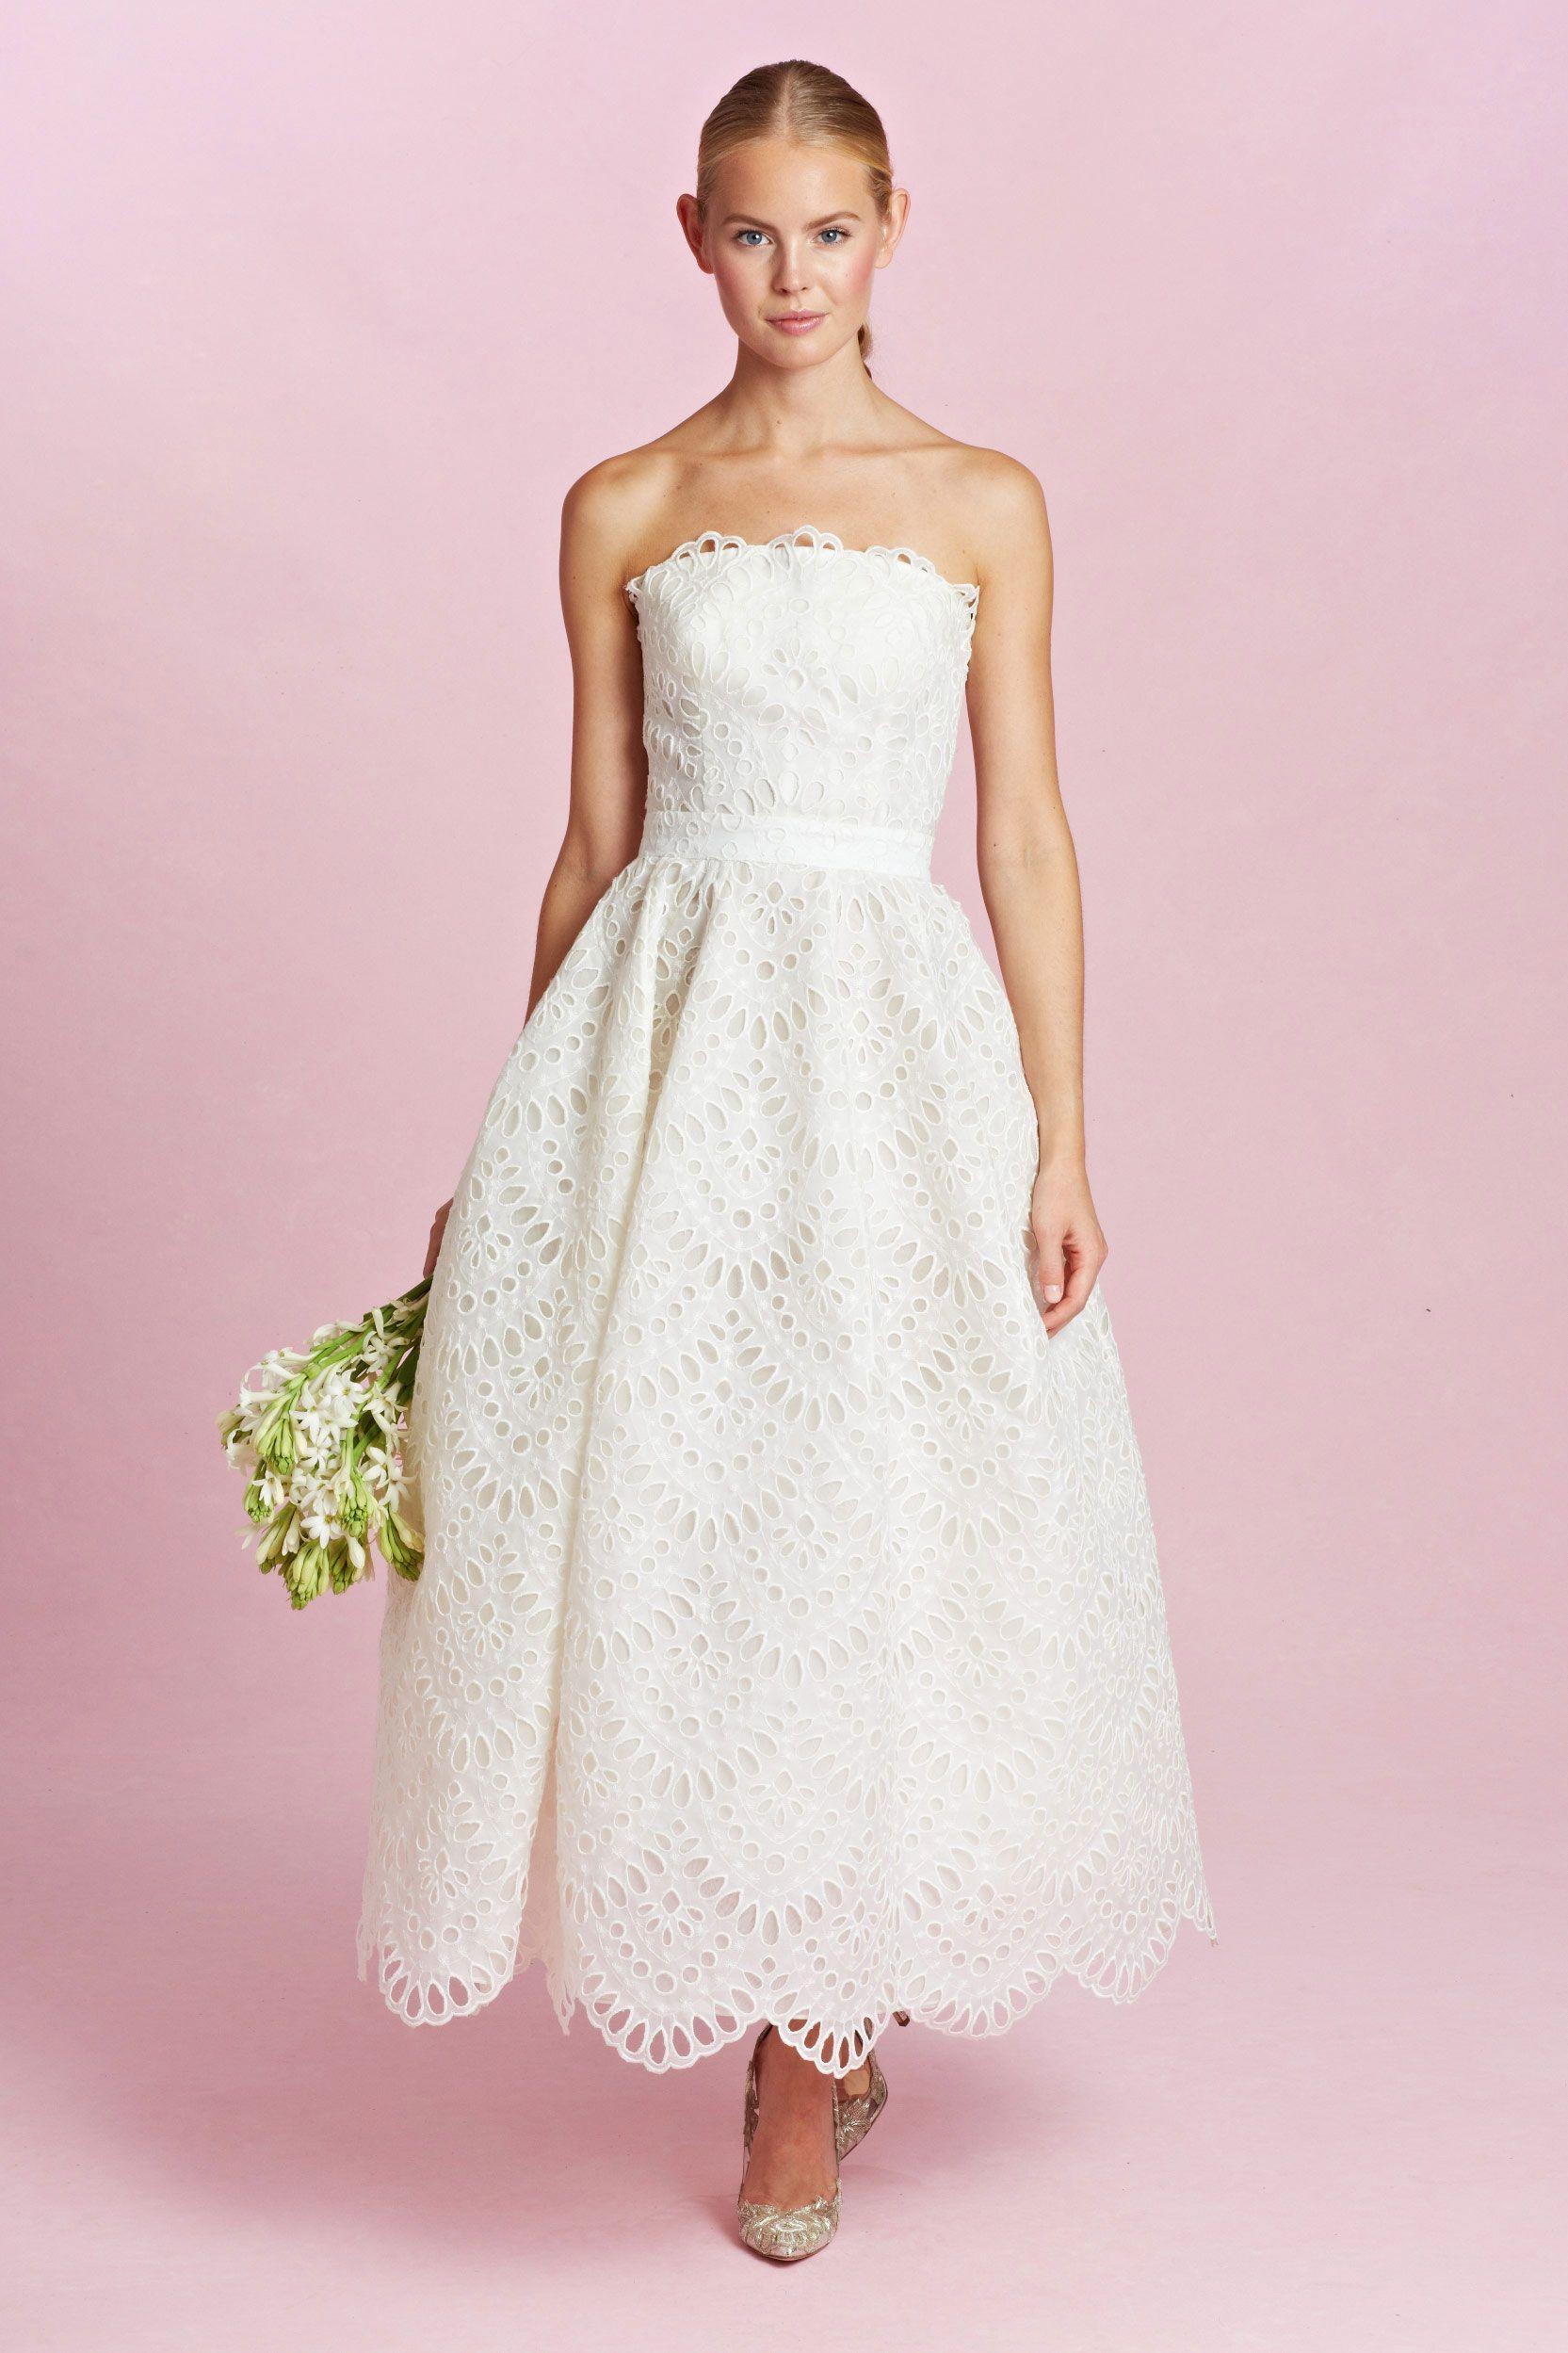 94ec8efbb1e Oscar de la Renta - 18 of the Best Gowns From Bridal Fashion Week ...